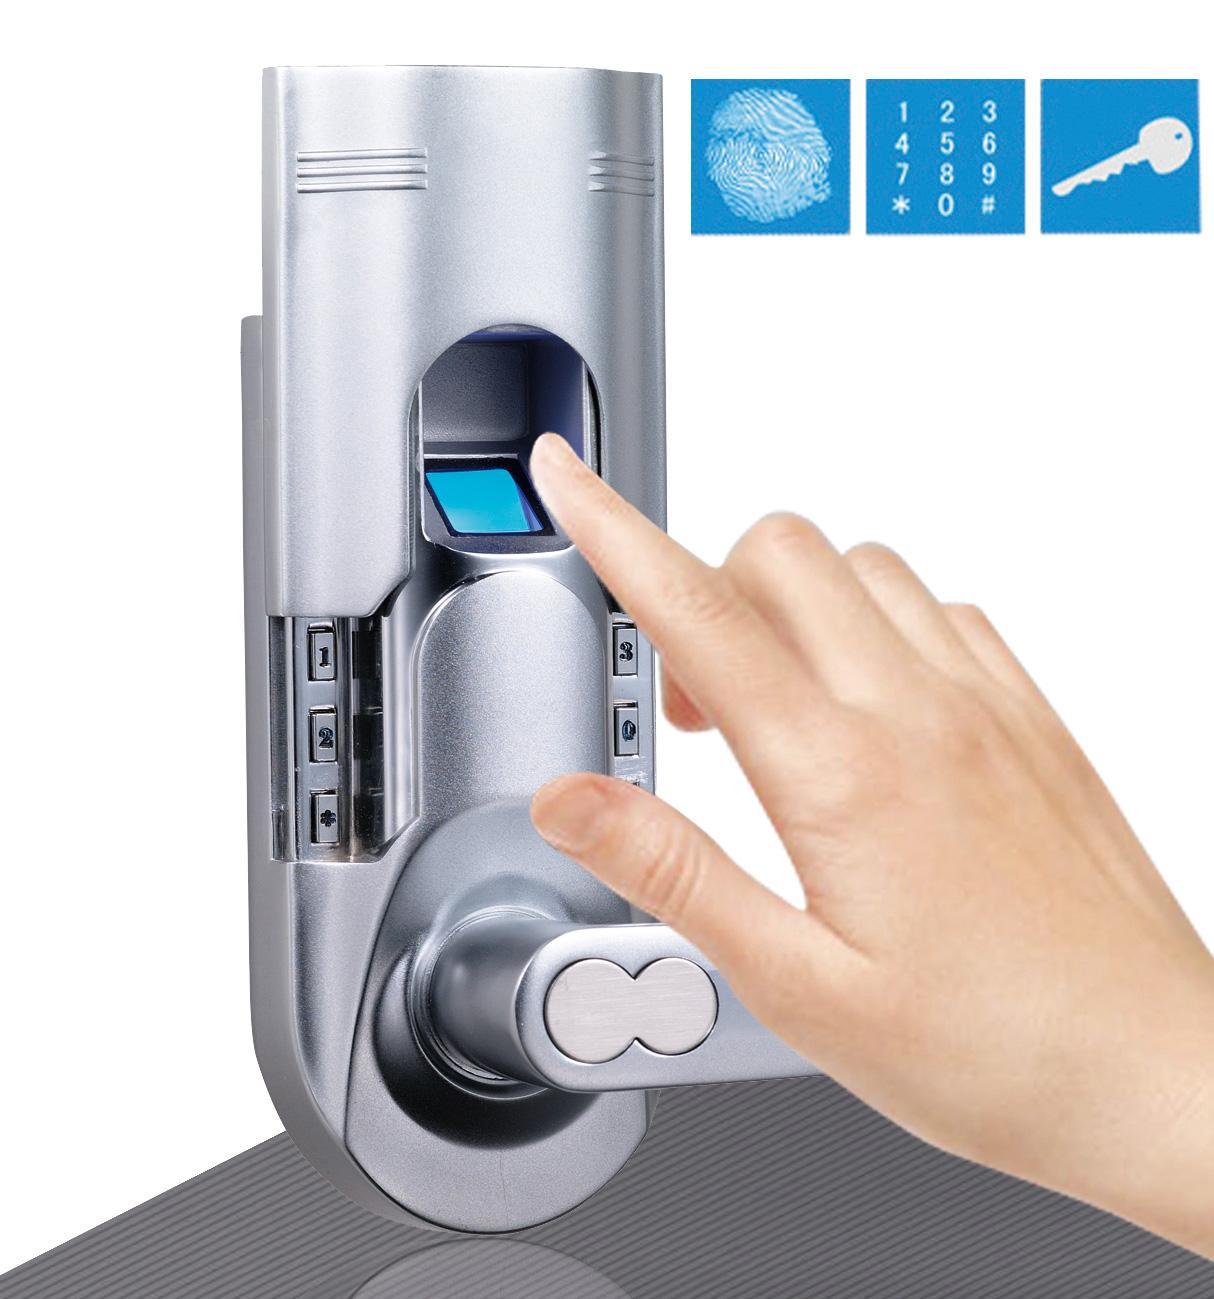 online cheap assa abloy digi digital electronic single latch biometric fingerprint keypad door. Black Bedroom Furniture Sets. Home Design Ideas